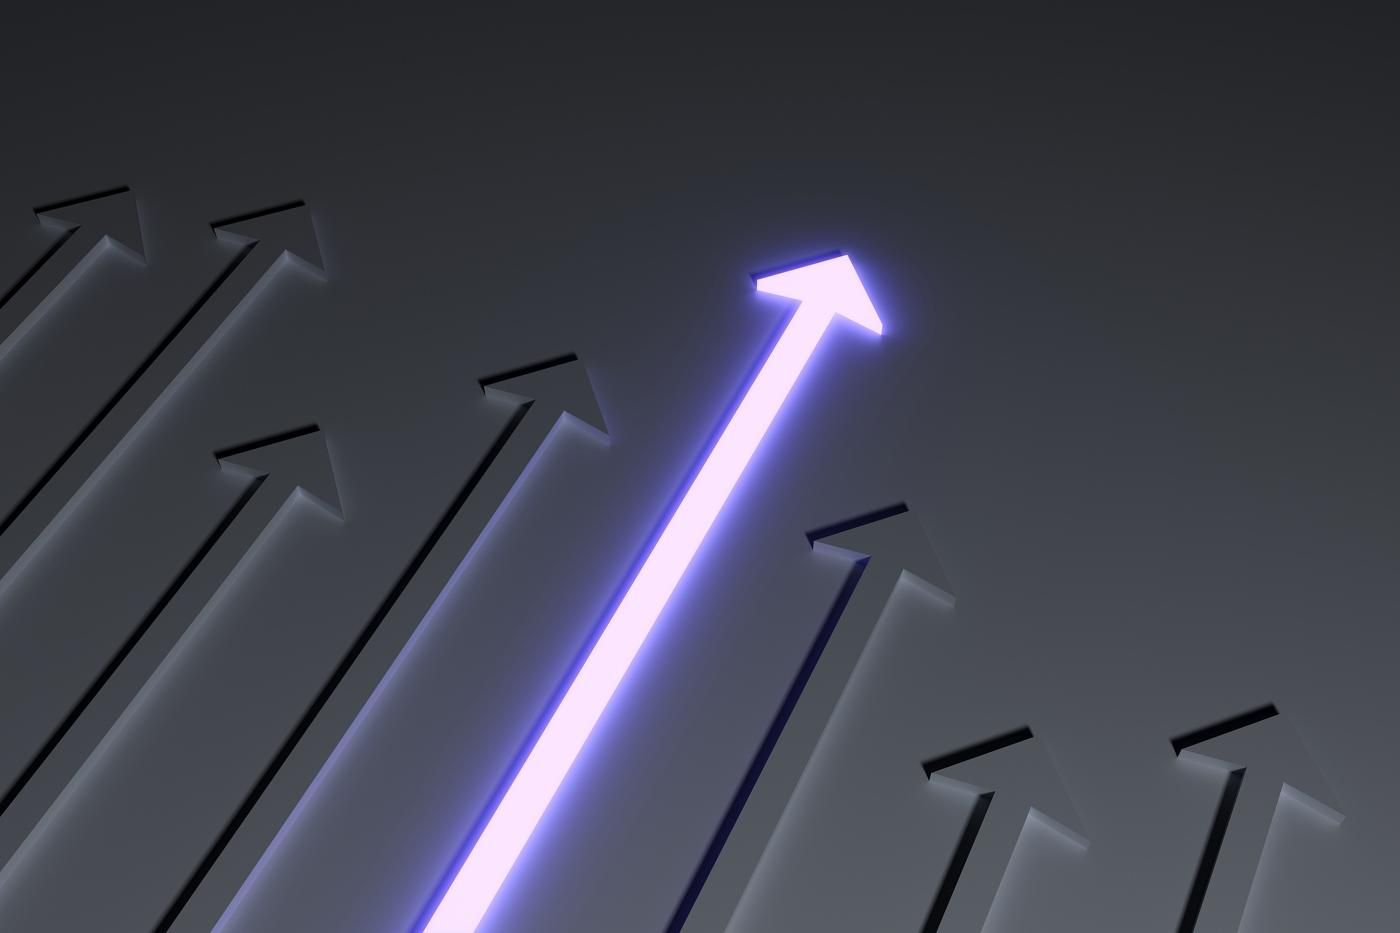 Arrow pointing up, Stock price increasing, Bullish stock price movement